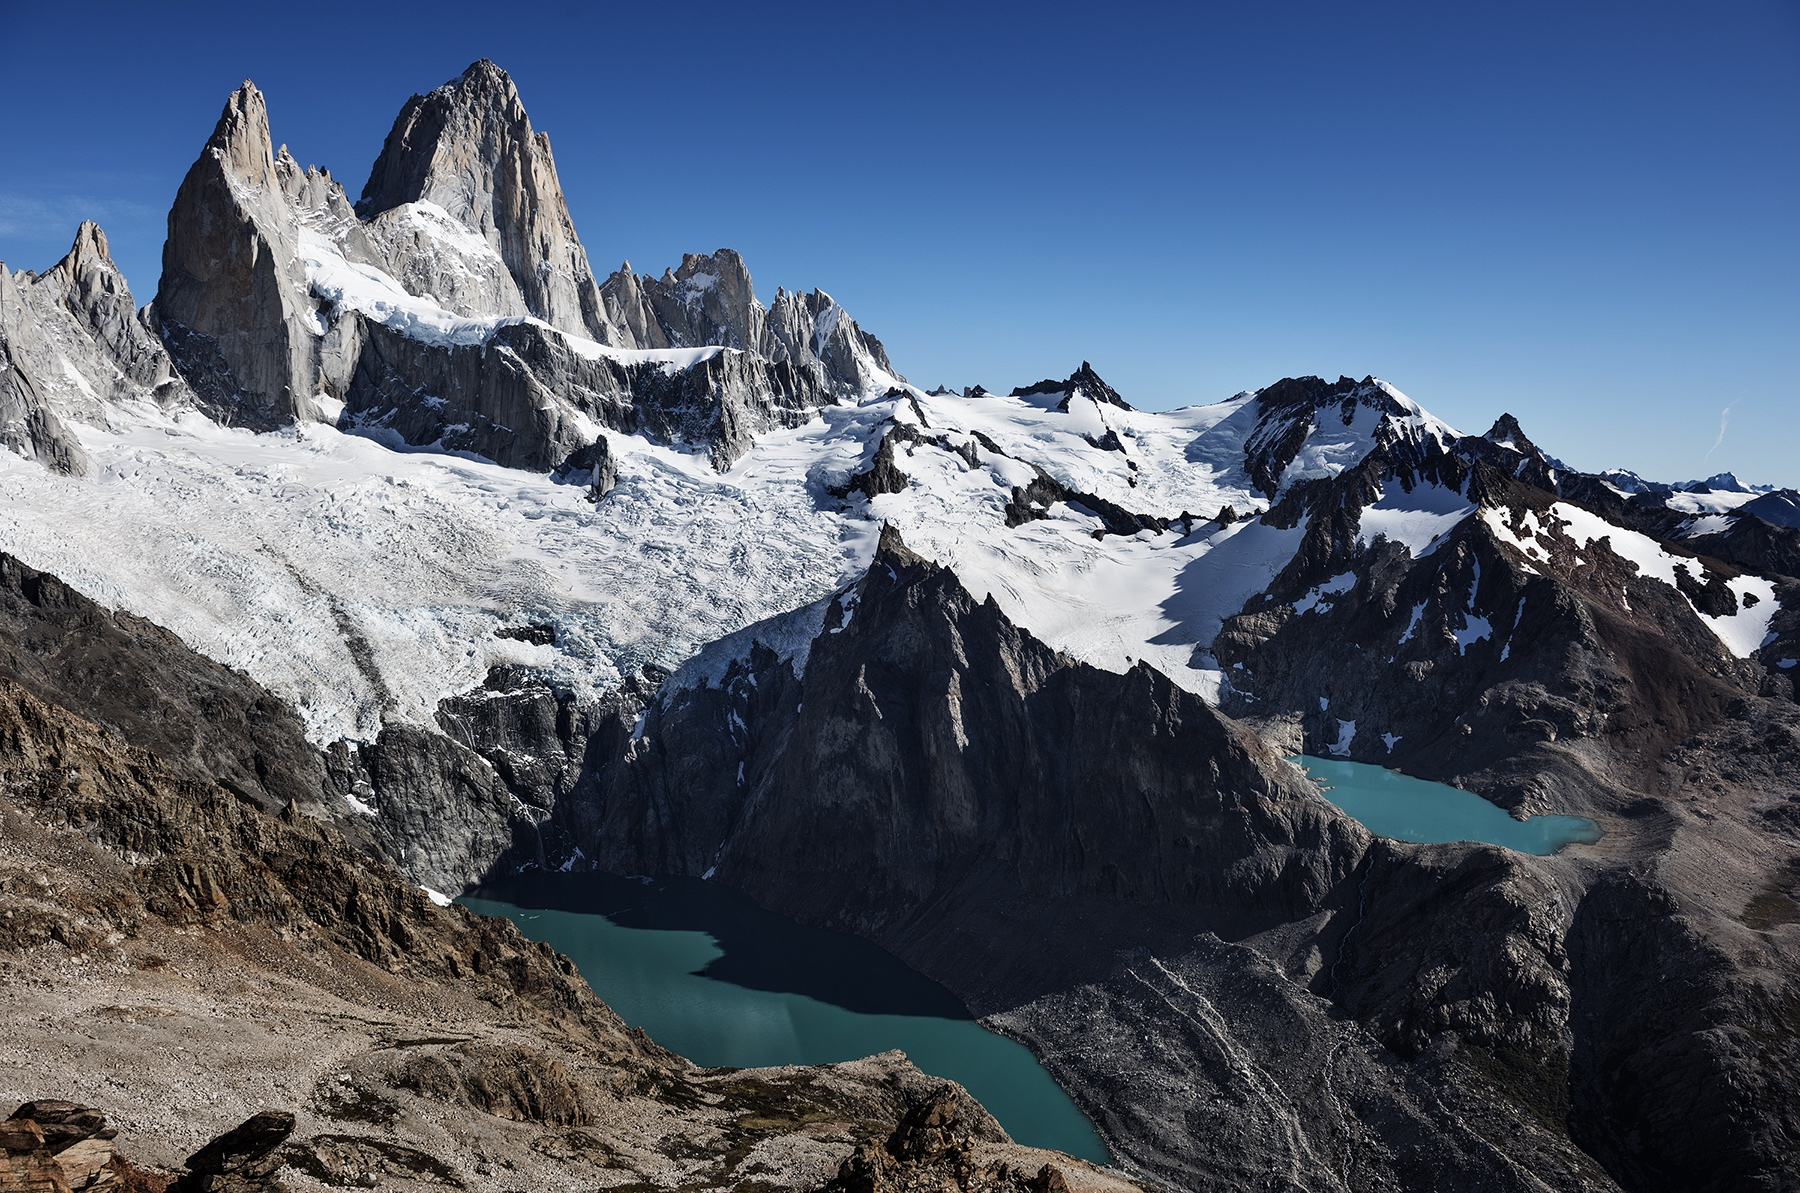 calendario-epson-2019-agosto-ande-ghiacciaio-blanco-fitz-roy-fabiano-ventura